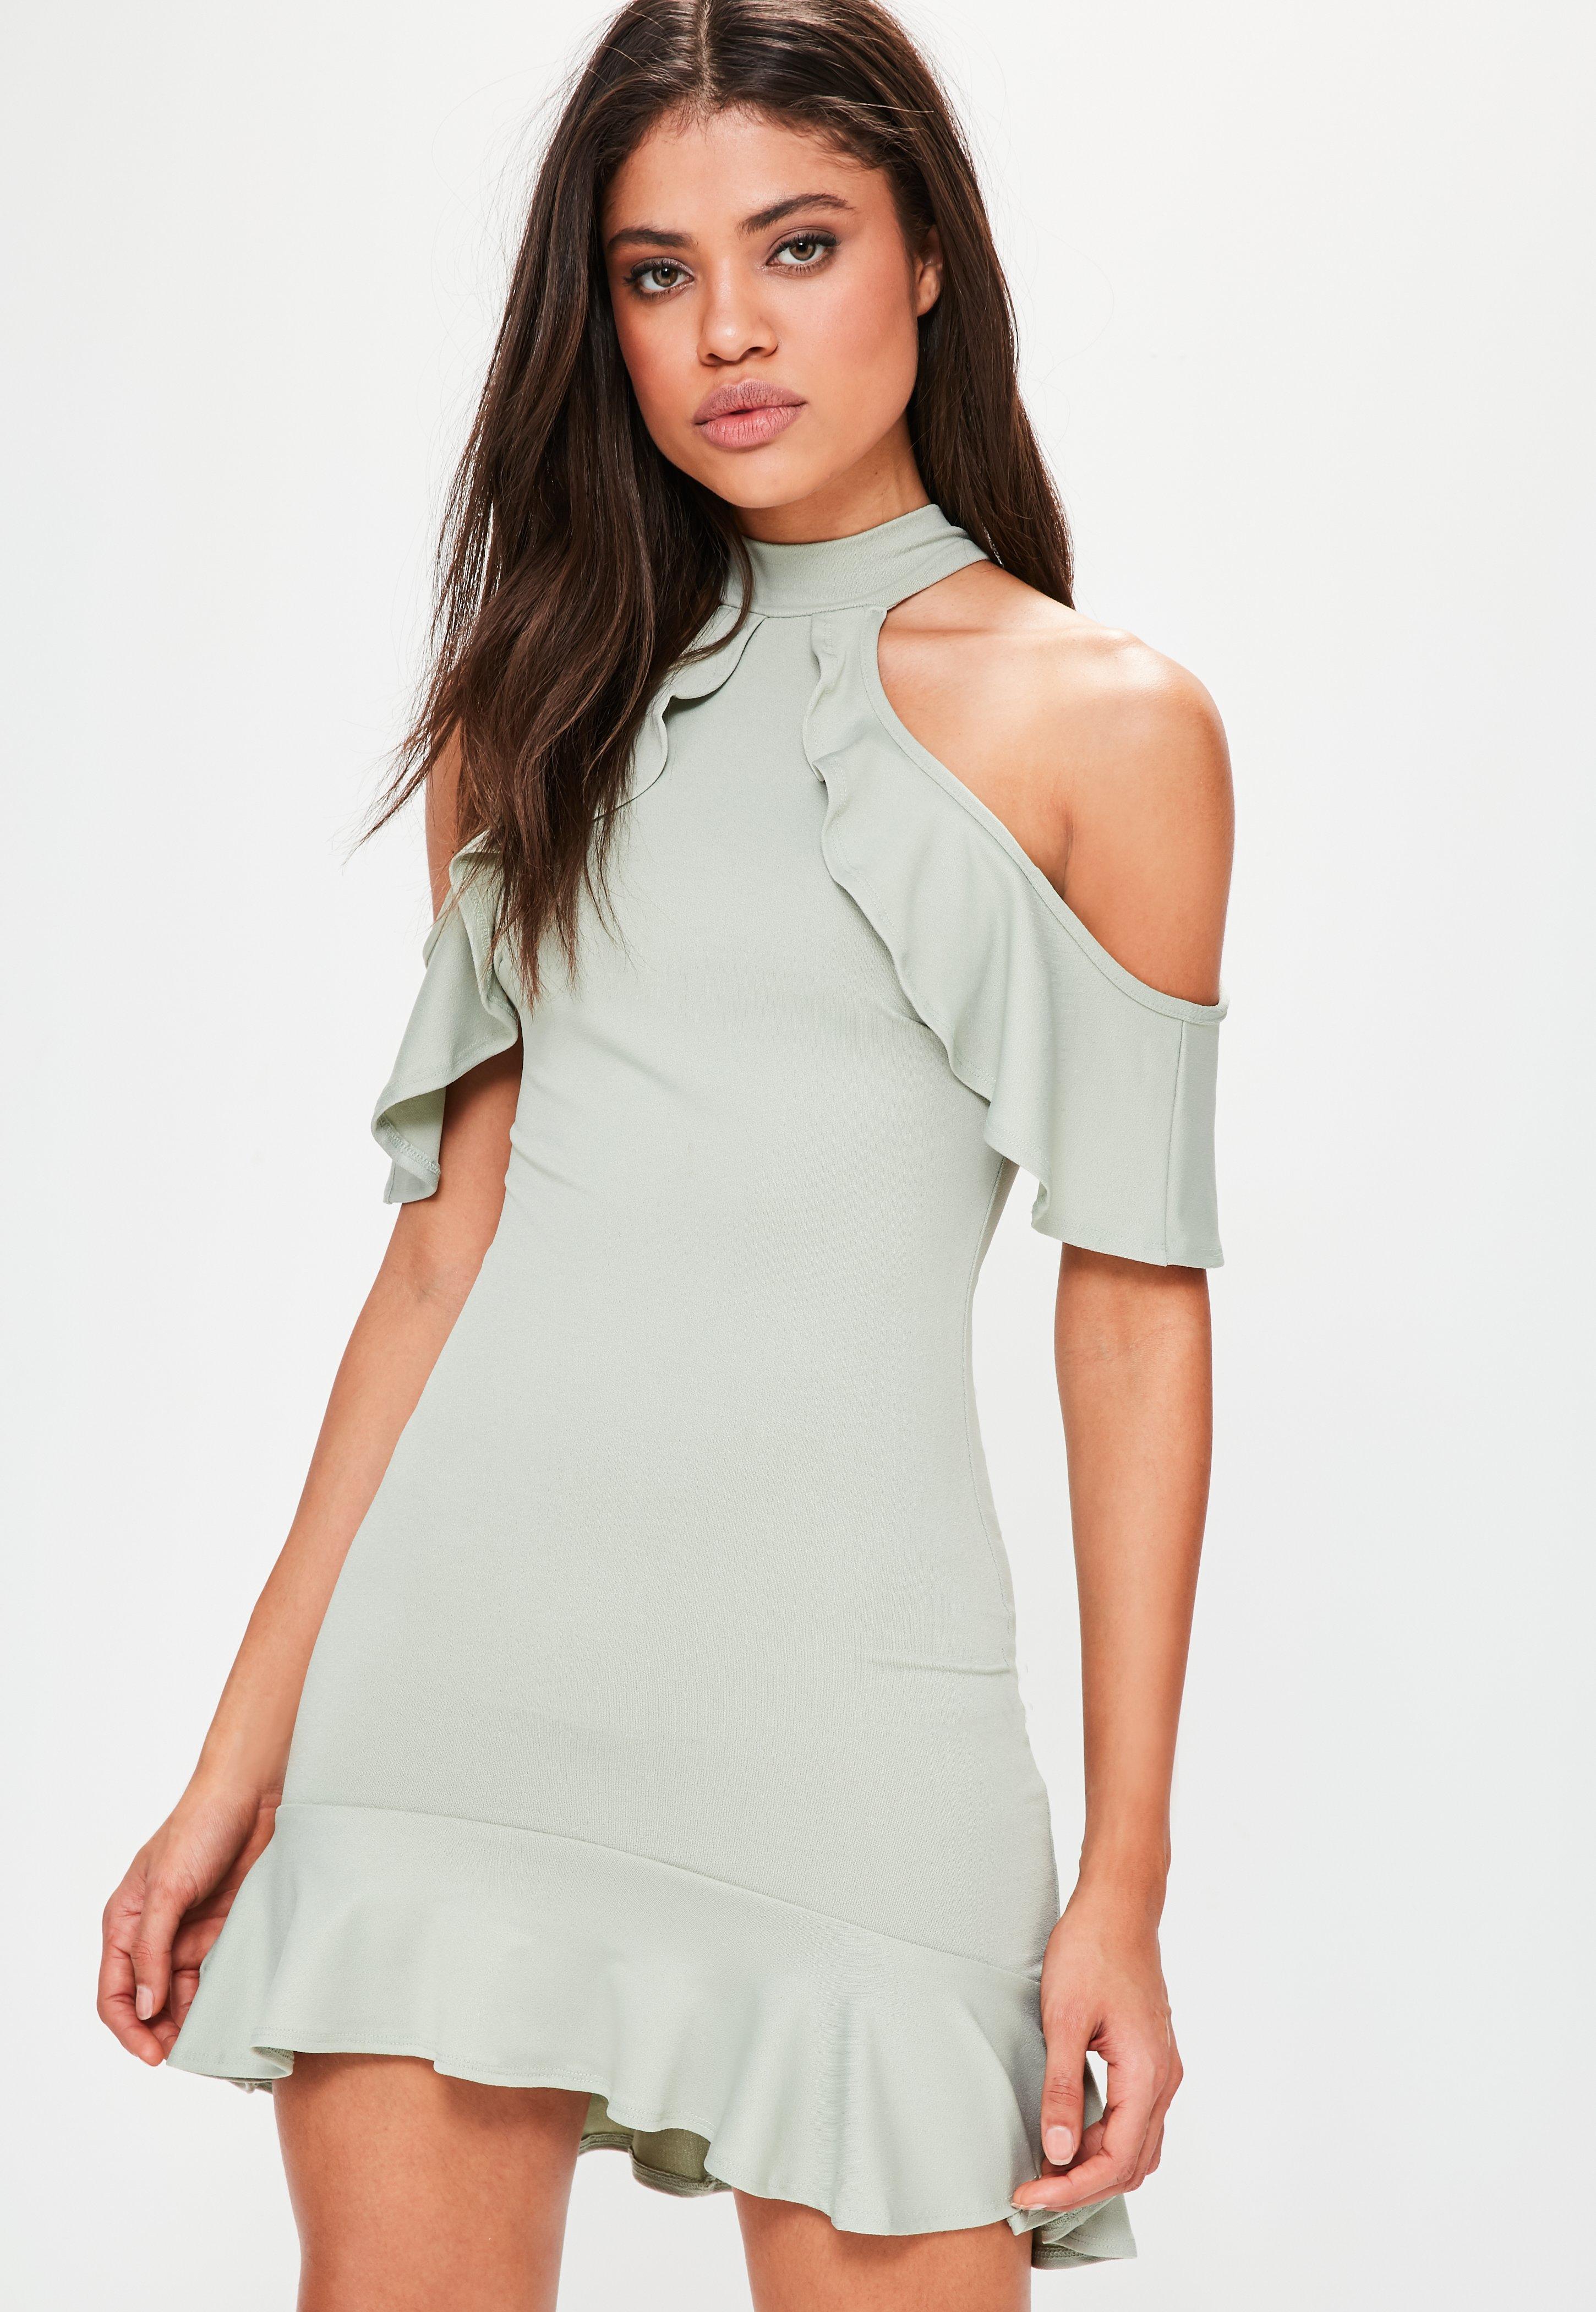 Green and White Mini Dress